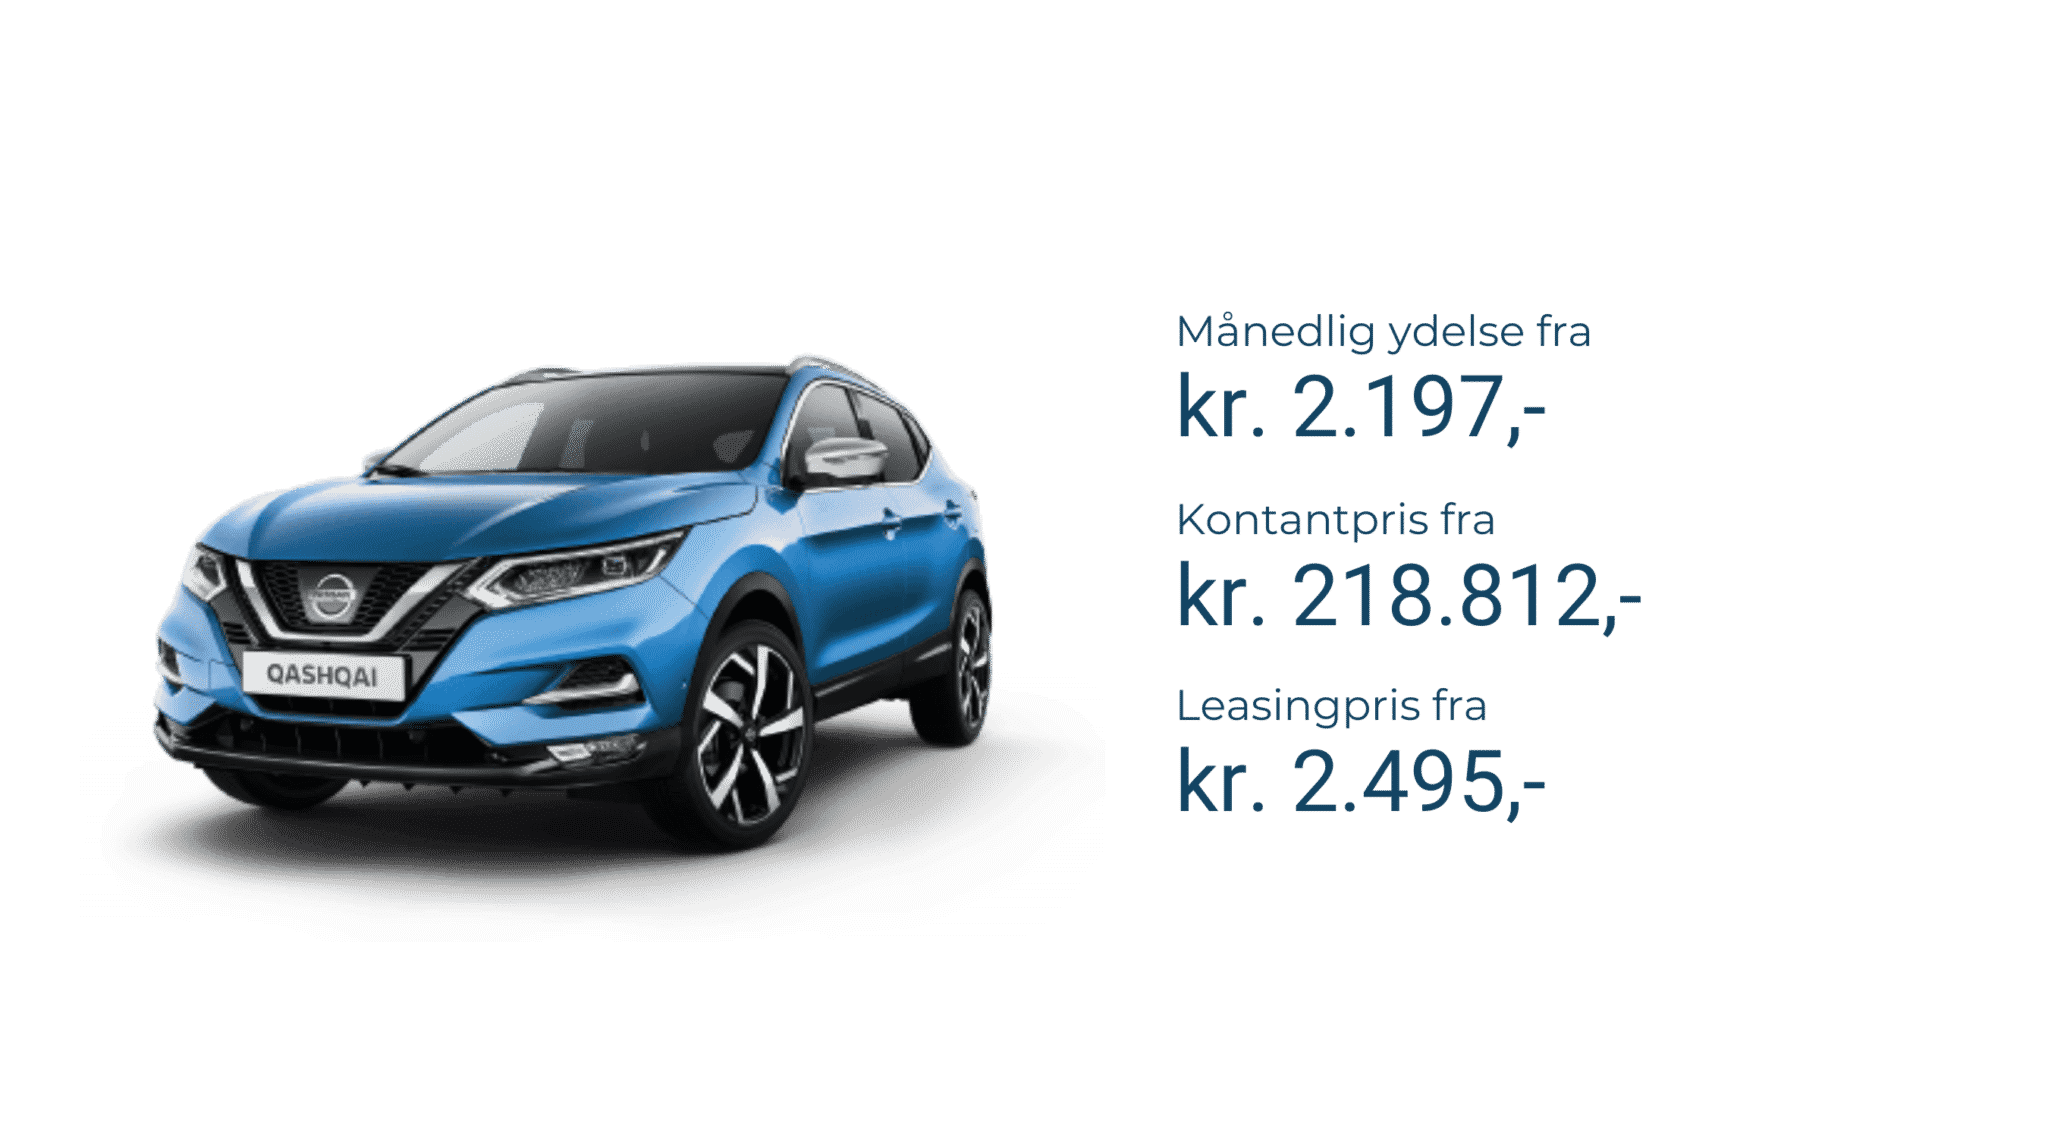 Nissan qashqai leasingpris